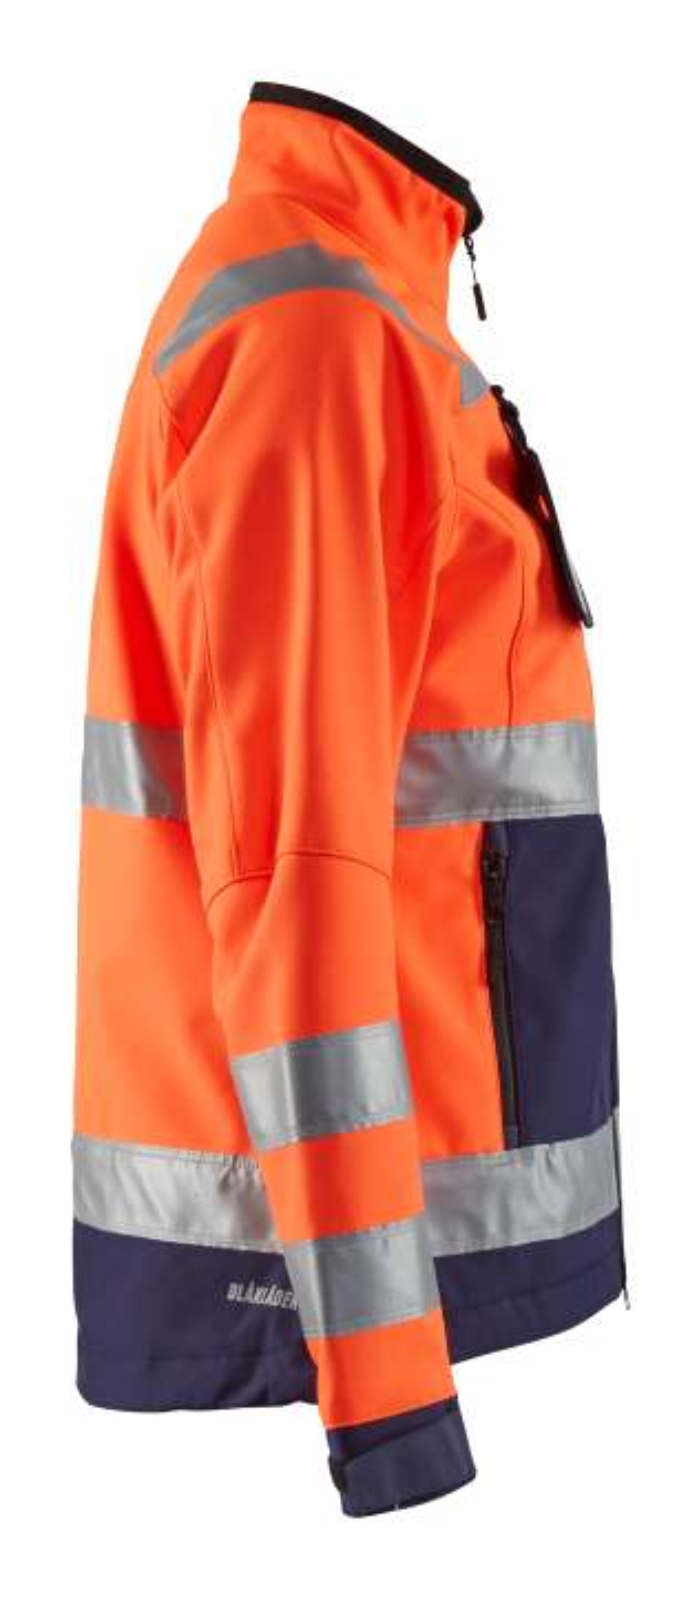 Blaklader Dames softshell jacks 49022517 High Vis oranje-marineblauw(5389)